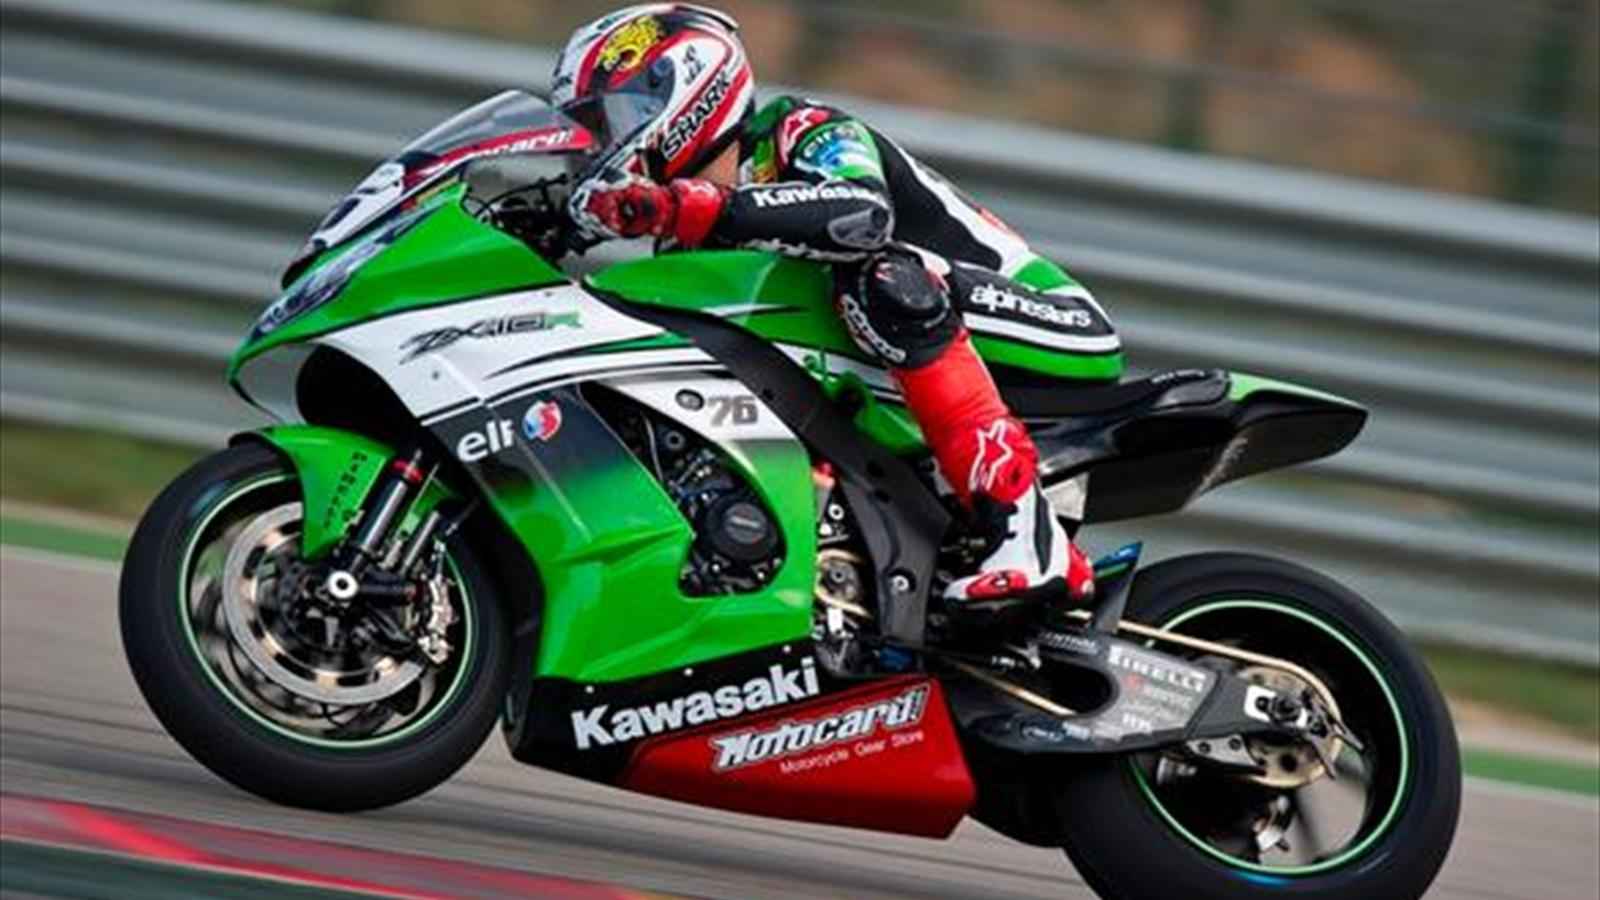 Assen WSBK All Sunday?s race results  Superbikes  Eurosport Asia # Assenti Wasbak_155029